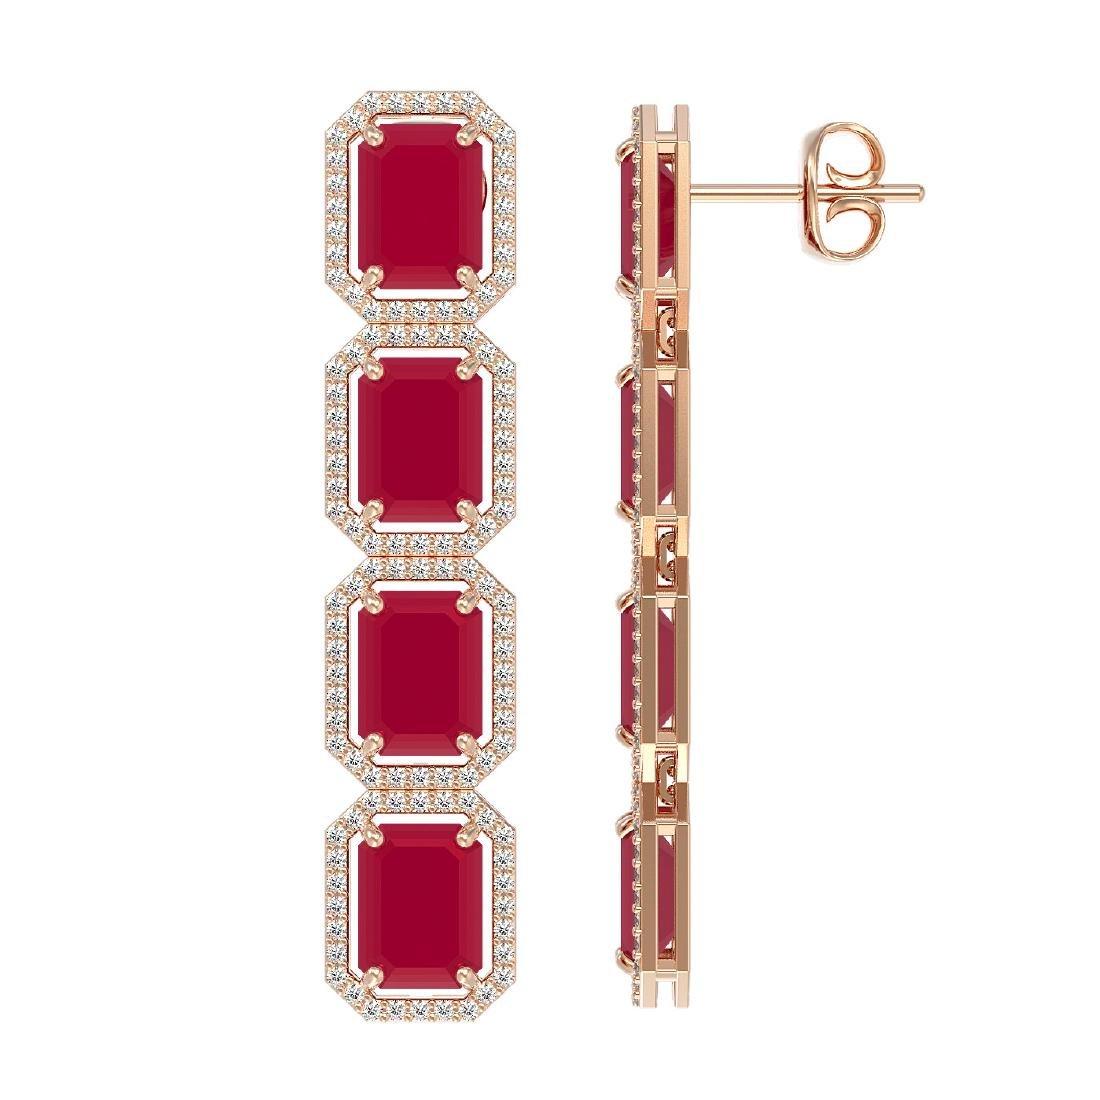 20.59 CTW Ruby & Diamond Halo Earrings 10K Rose Gold - 2